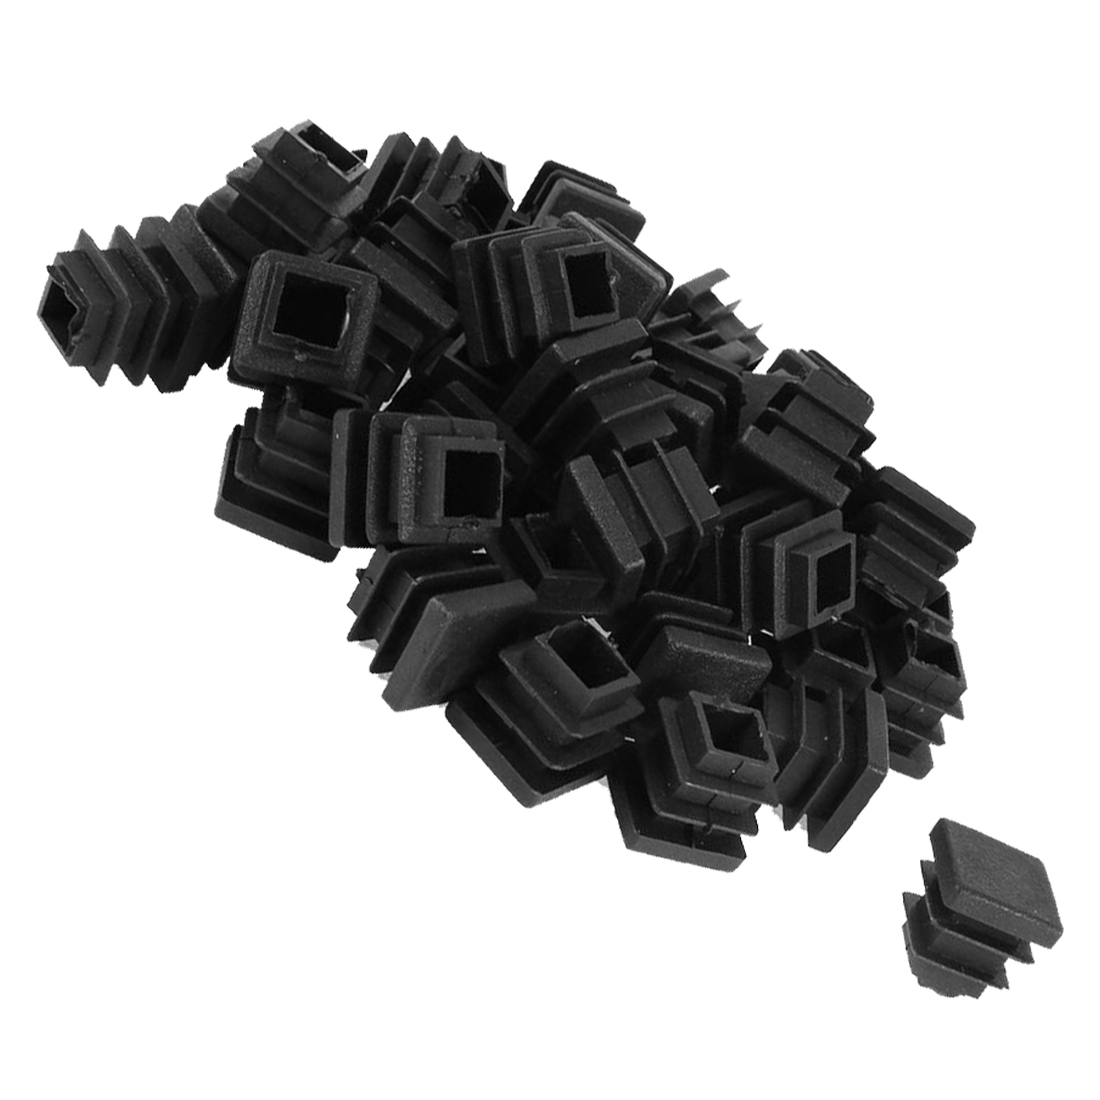 Hot Sale 50 Pcs Plastic Blanking End Cap Square Tube Insert 16mmx16mm Black Blank Tube Plastic Plug Leg Cap Protector Pads Floor